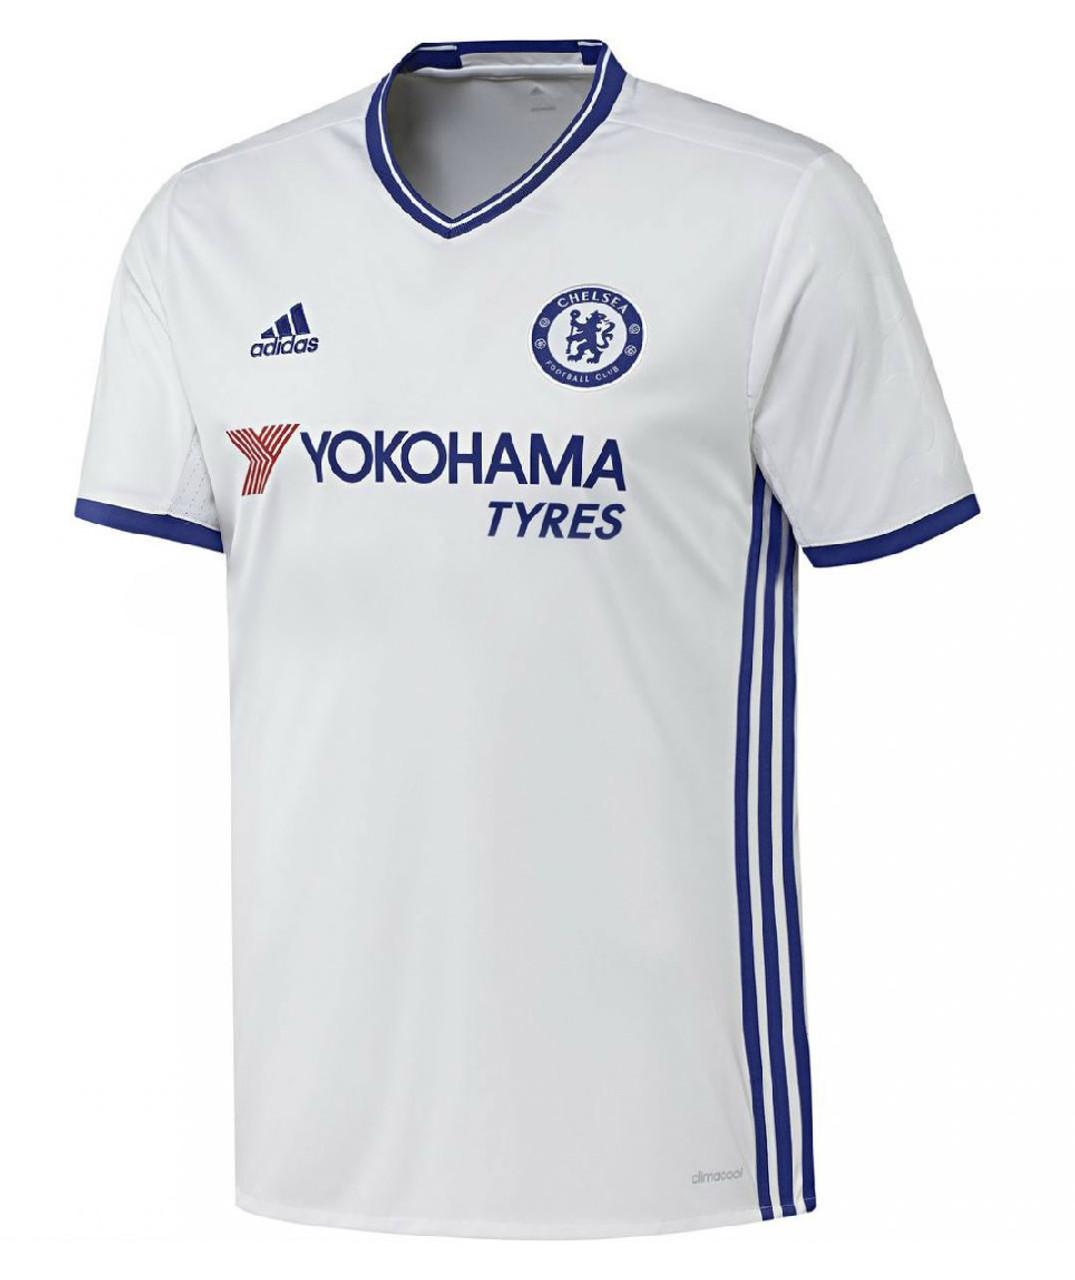 7f9e65c55 Adidas Chelsea FC Third Kit 16 17 - White Chelsea Blue - ohp soccer